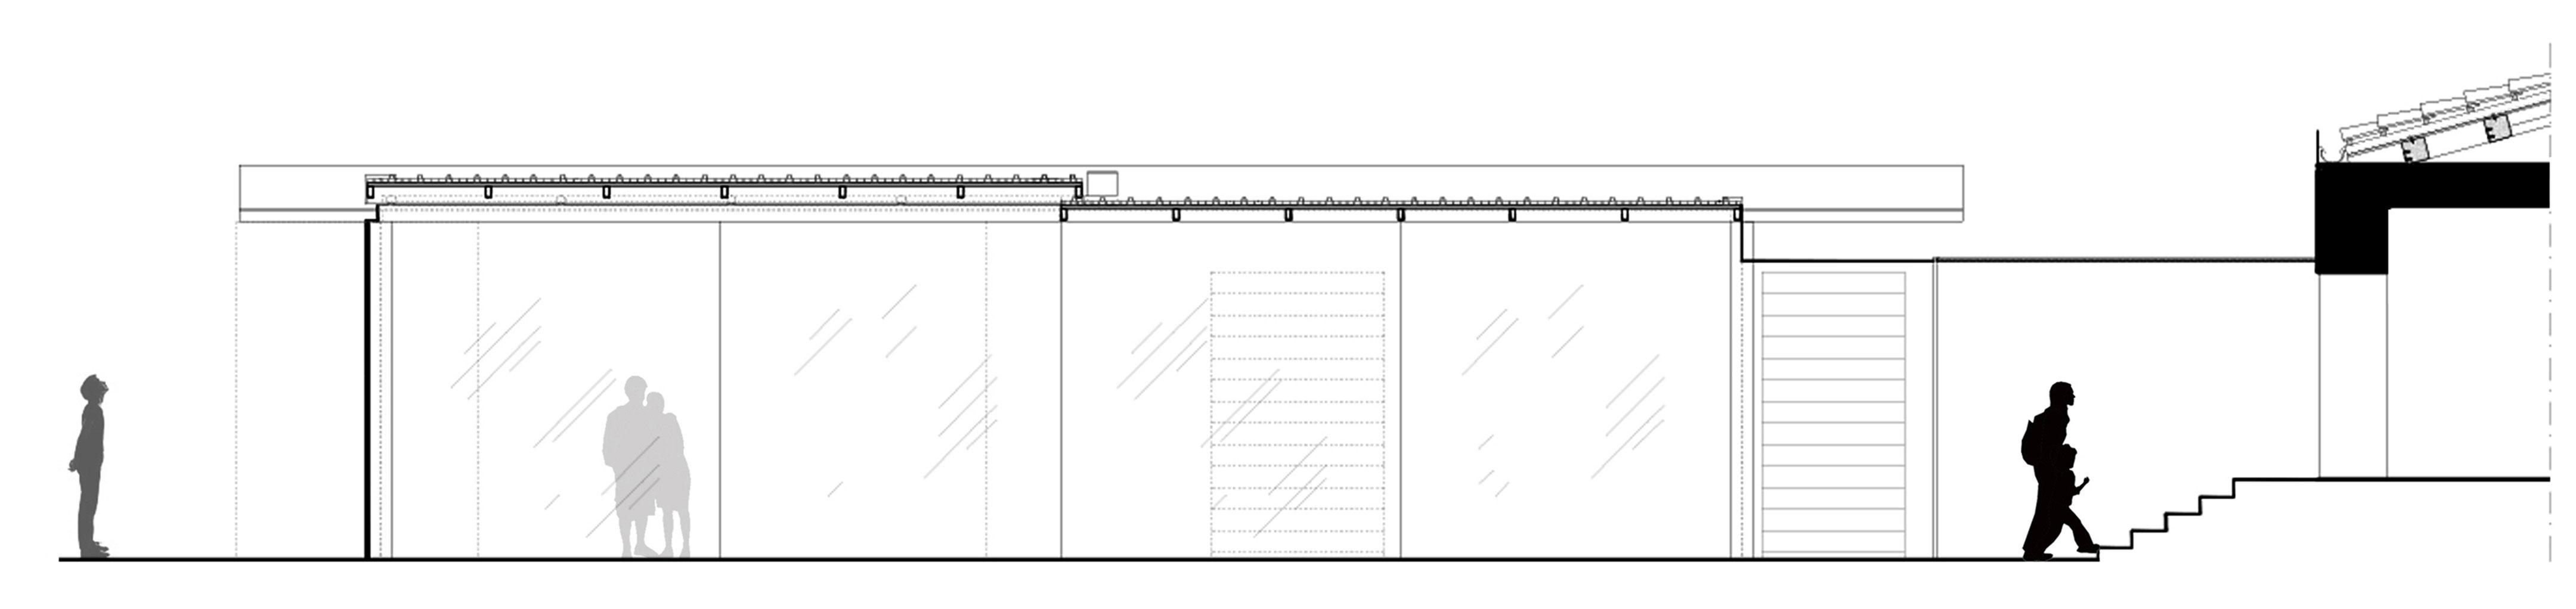 CRV House in Viagrande by ACA Amore Campione Architettura-28